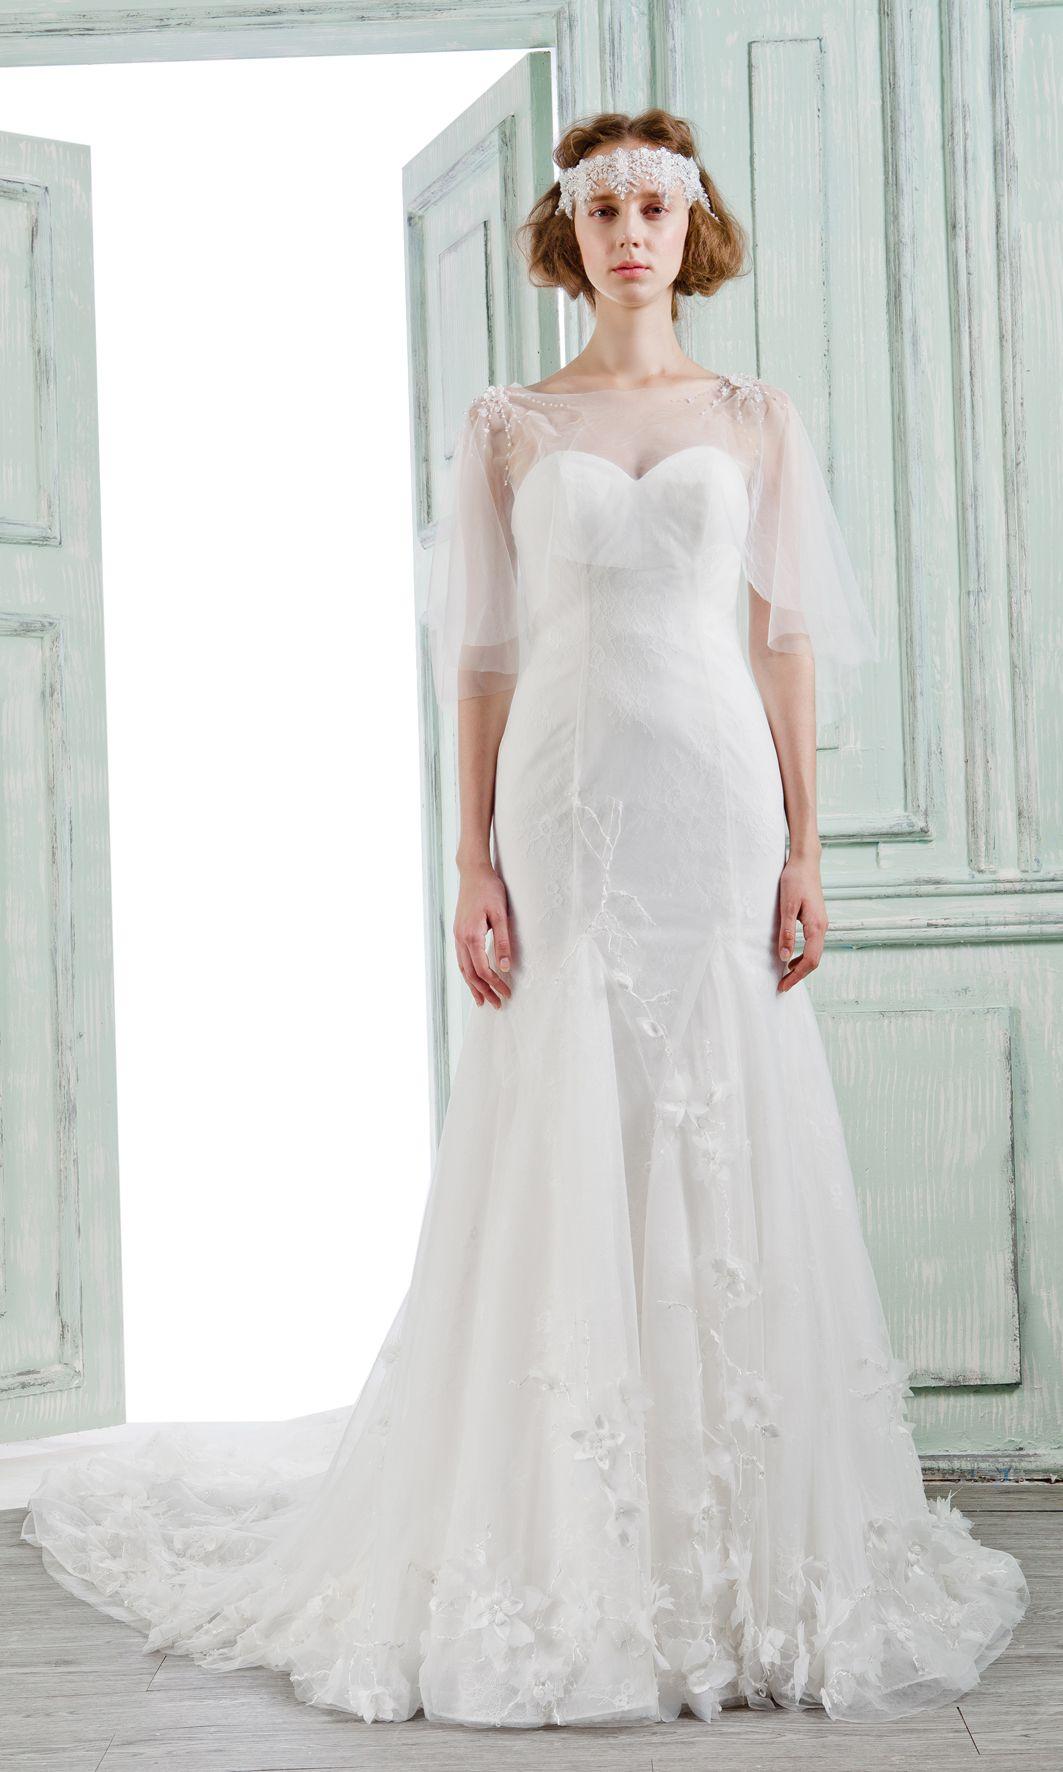 Bella Bride Glamorous Lace Mermaid Wedding Dresses With